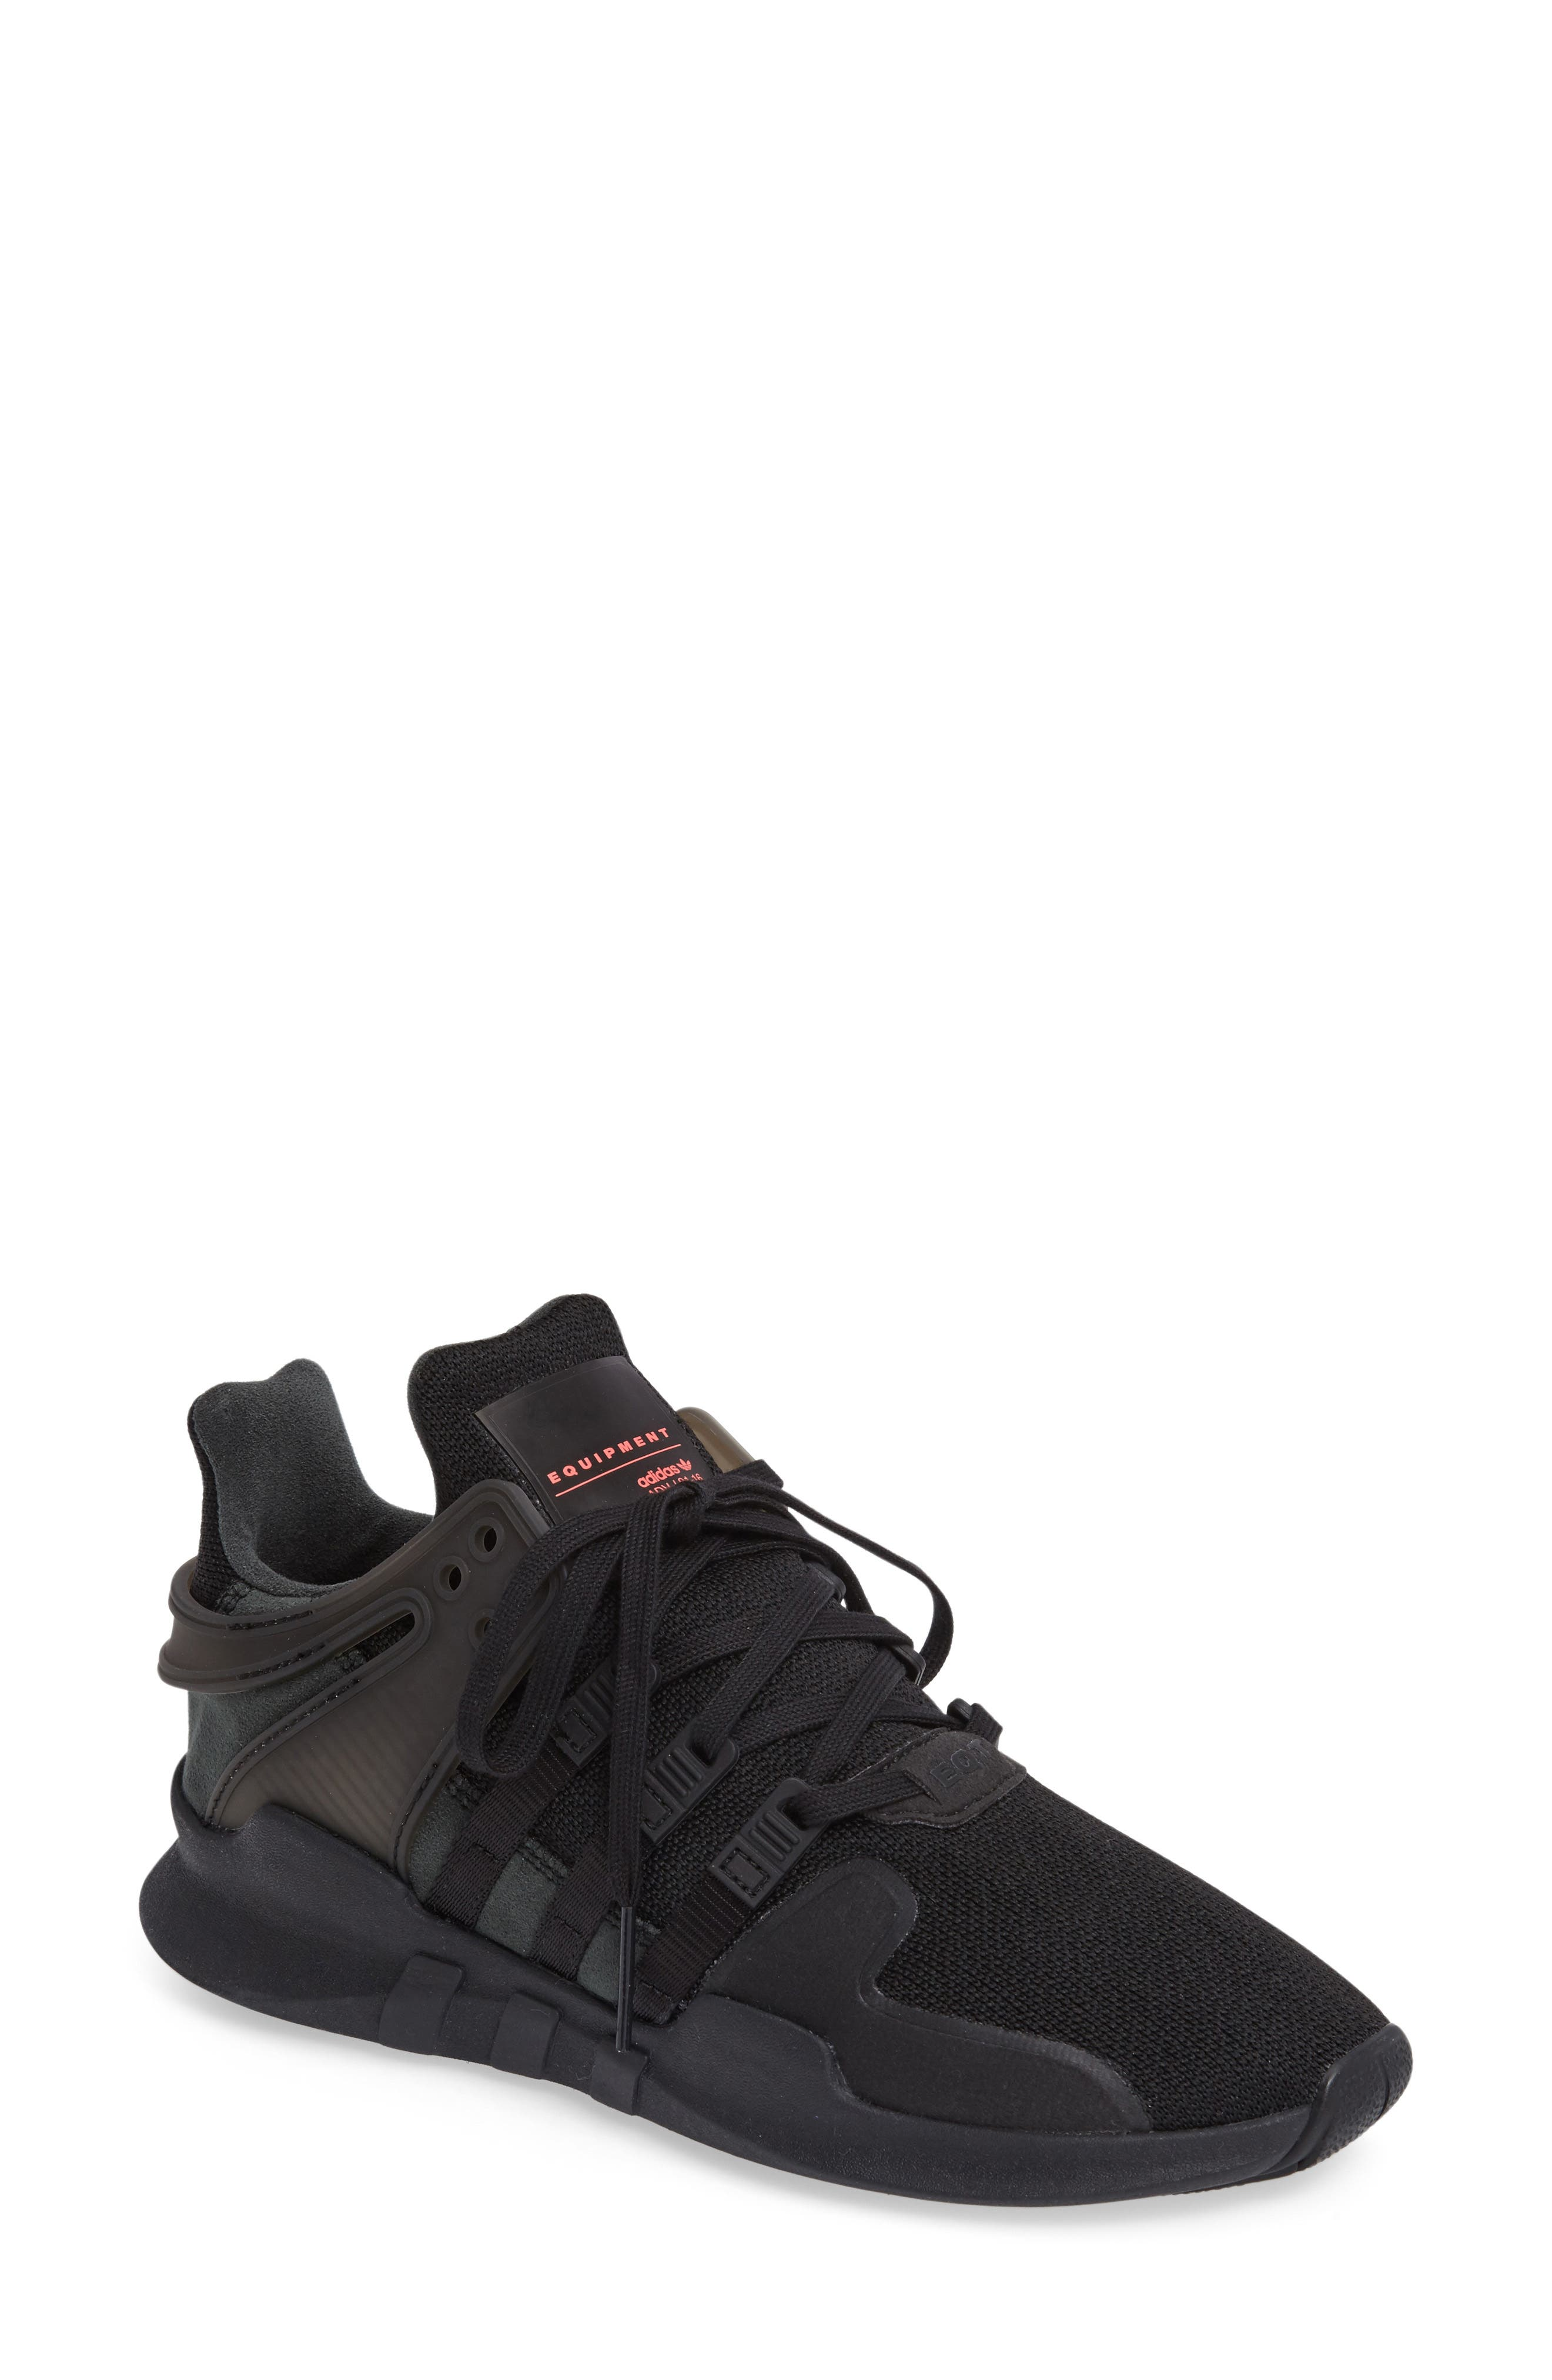 Alternate Image 1 Selected - adidas Equipment Support ADV Sneaker (Toddler, Little Kid & Big Kid)